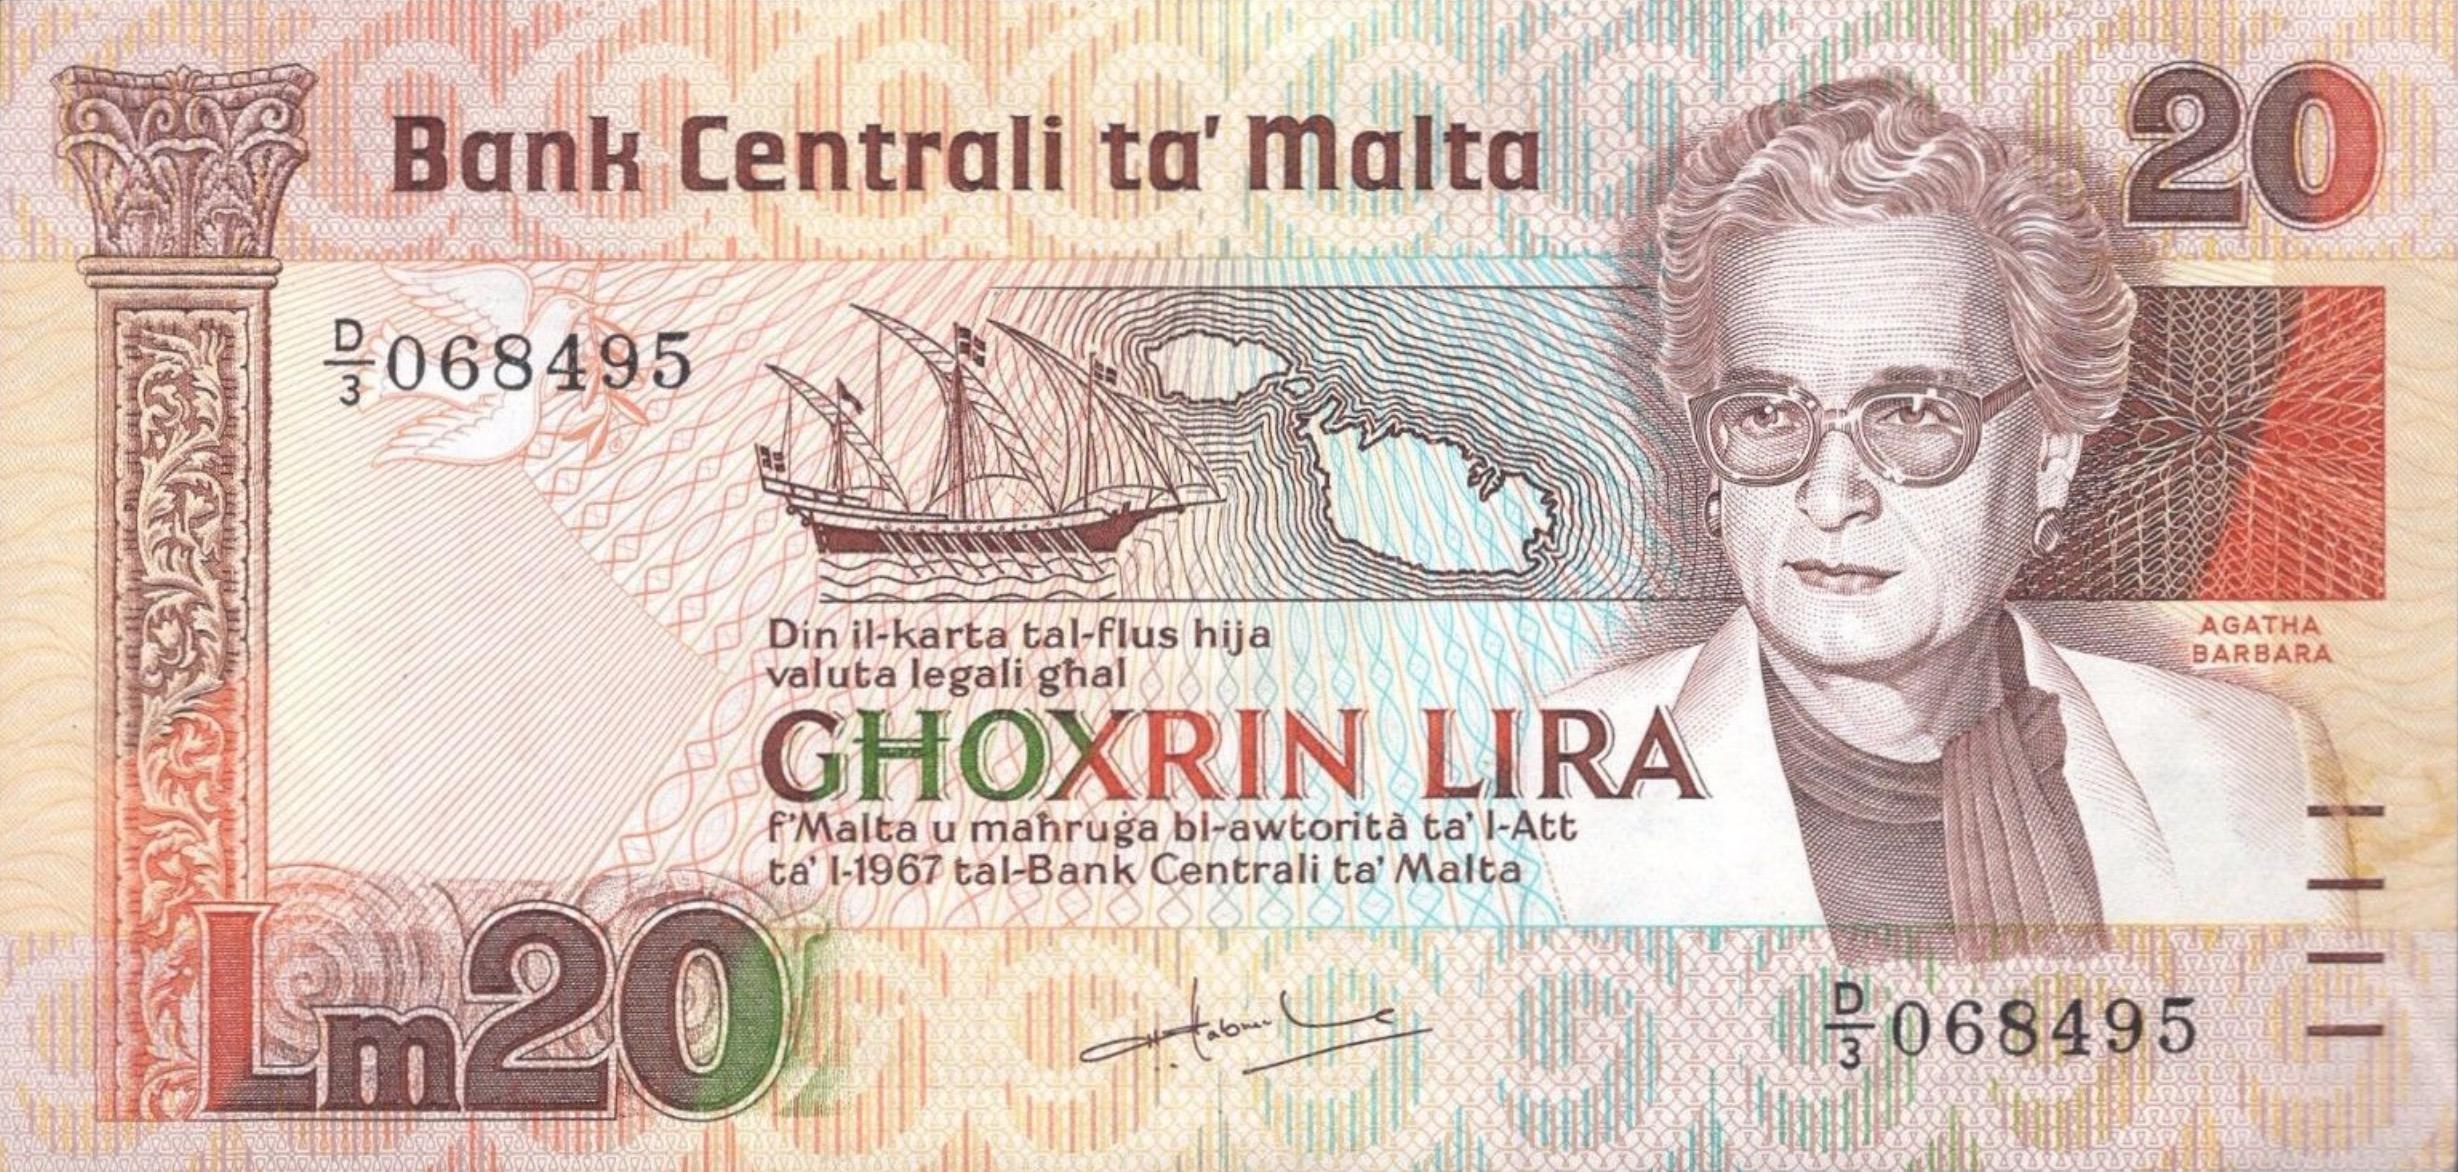 20 Maltese Liri banknote (Agatha Barbara)